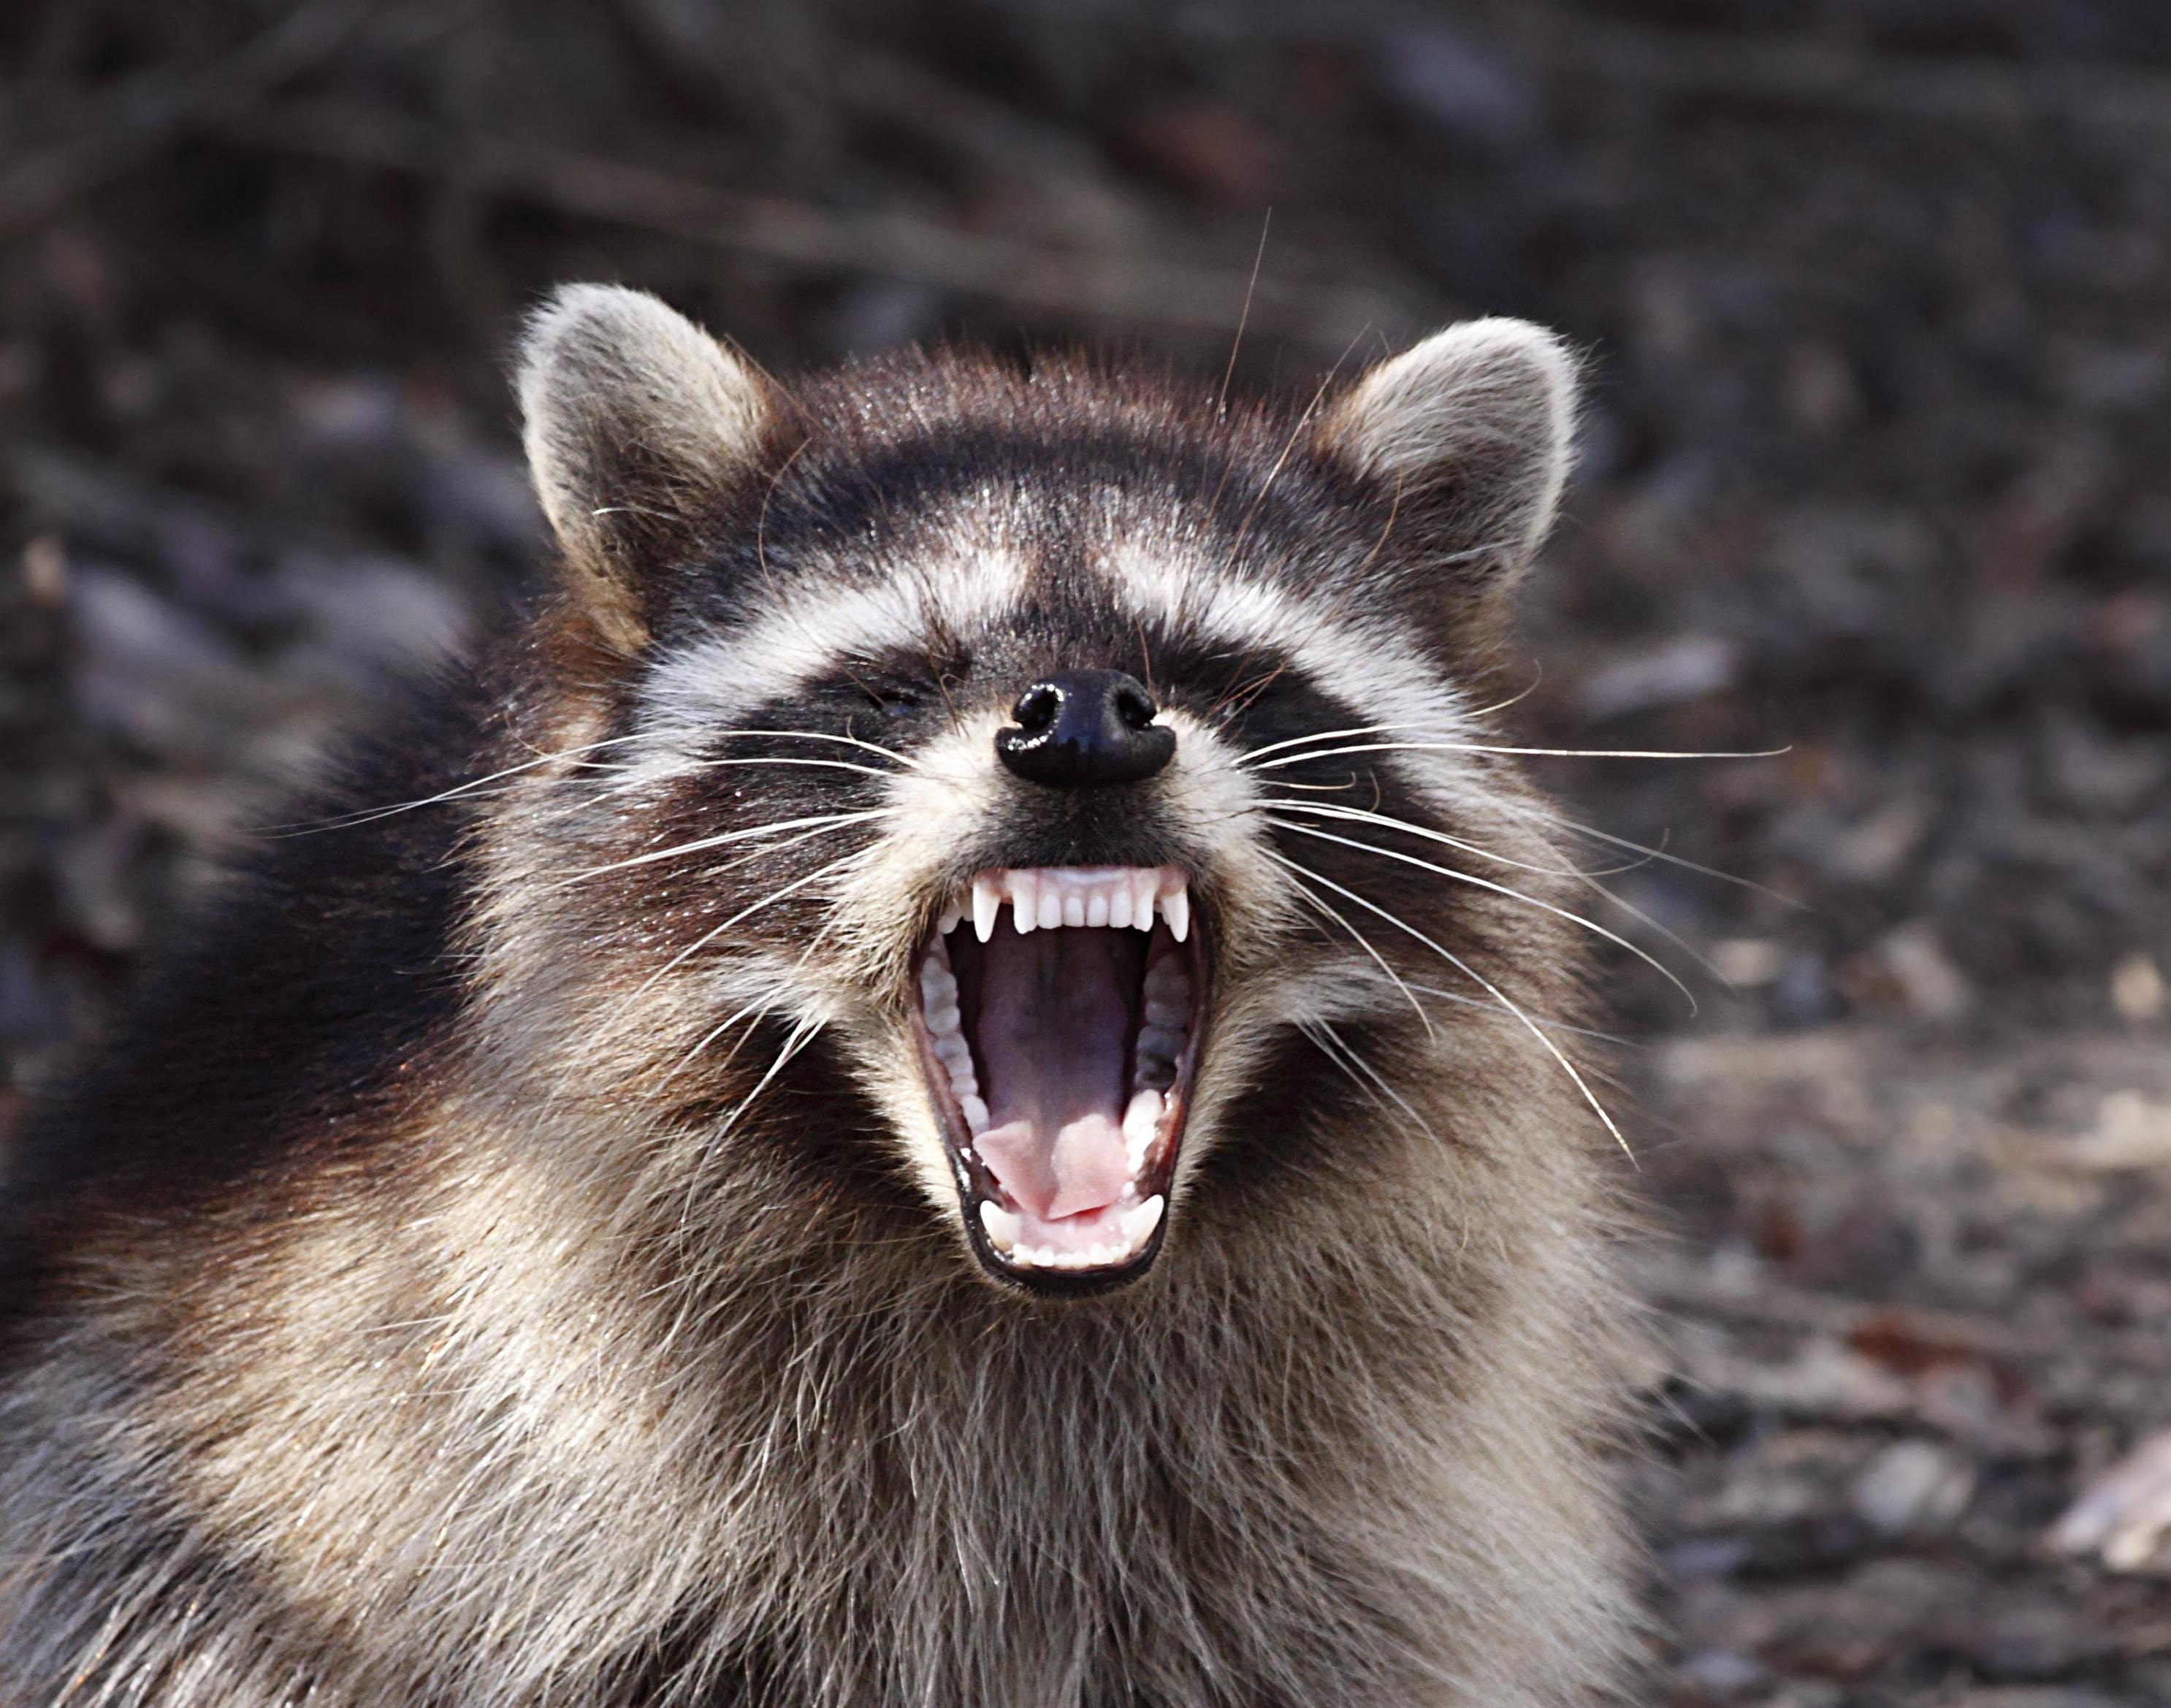 Raccoon near Guadalupe, California